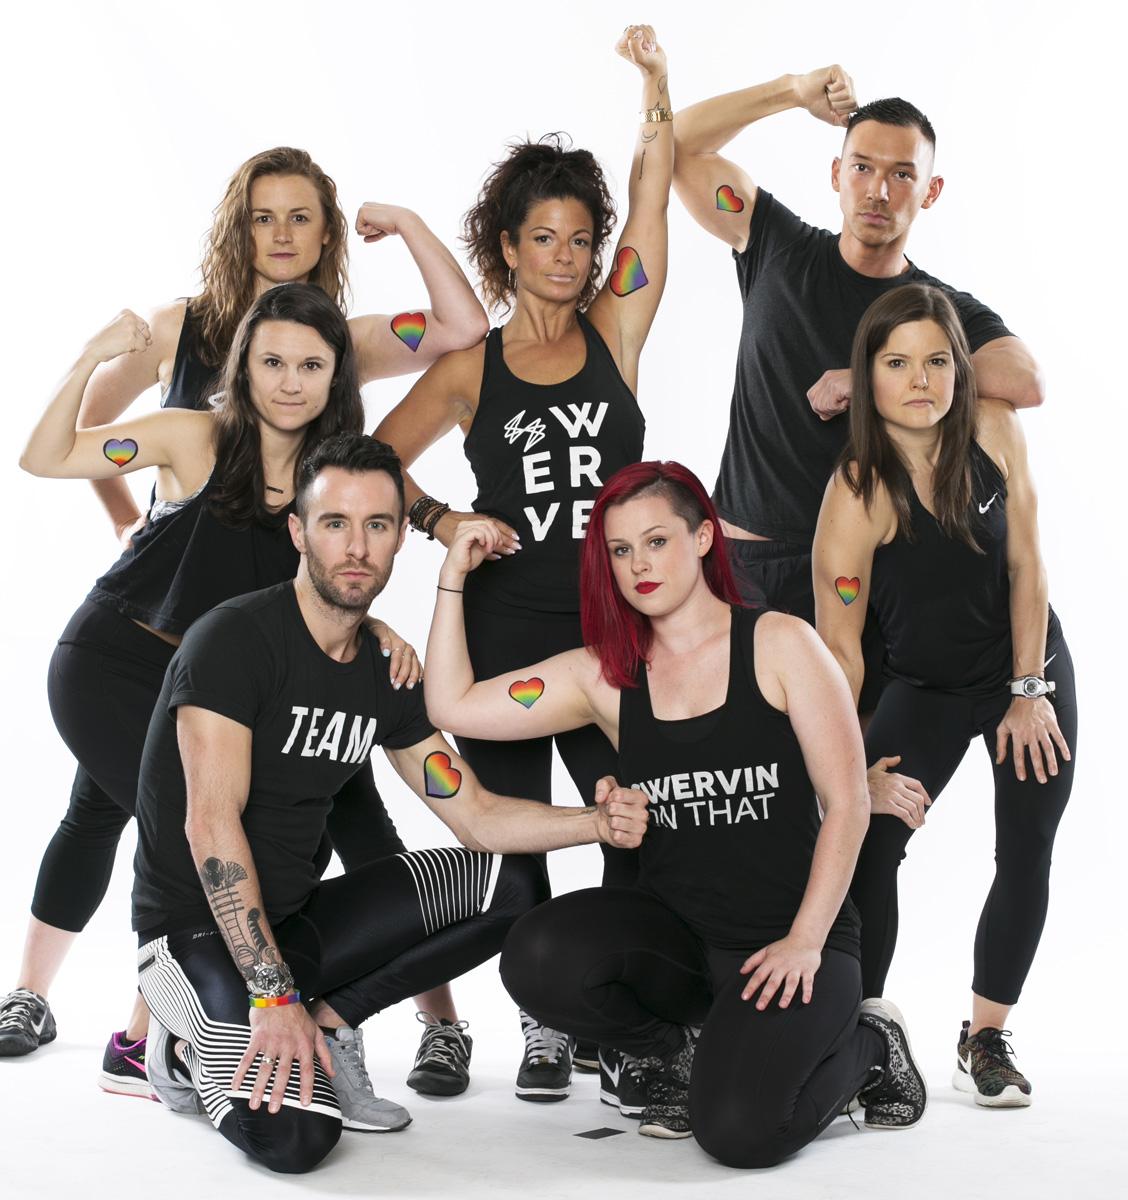 SWERVE Team